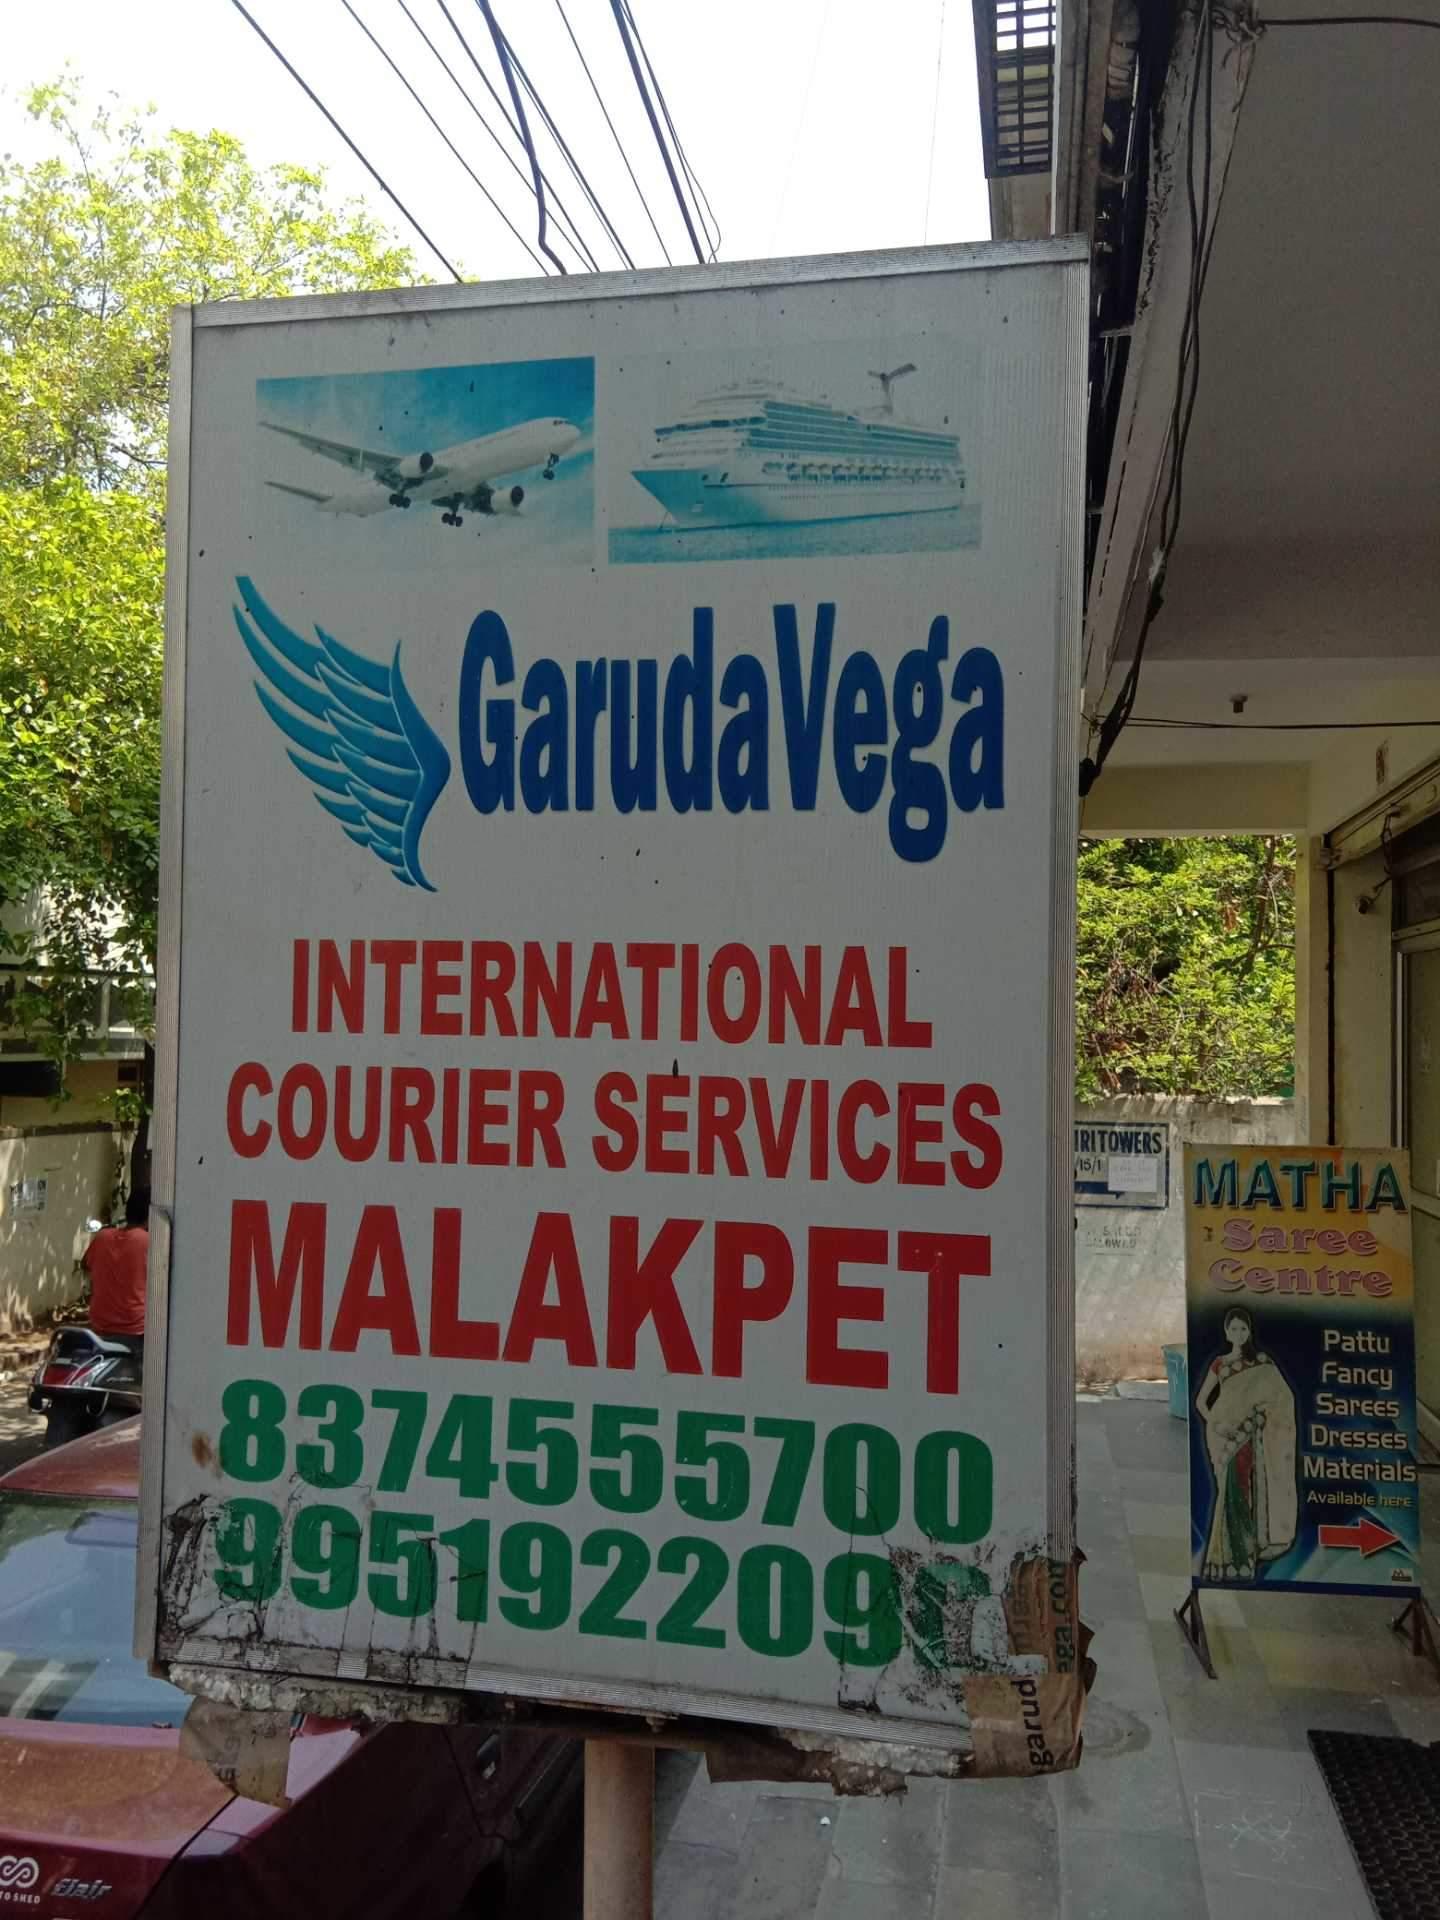 Top 30 Garudavega International Courier Services in